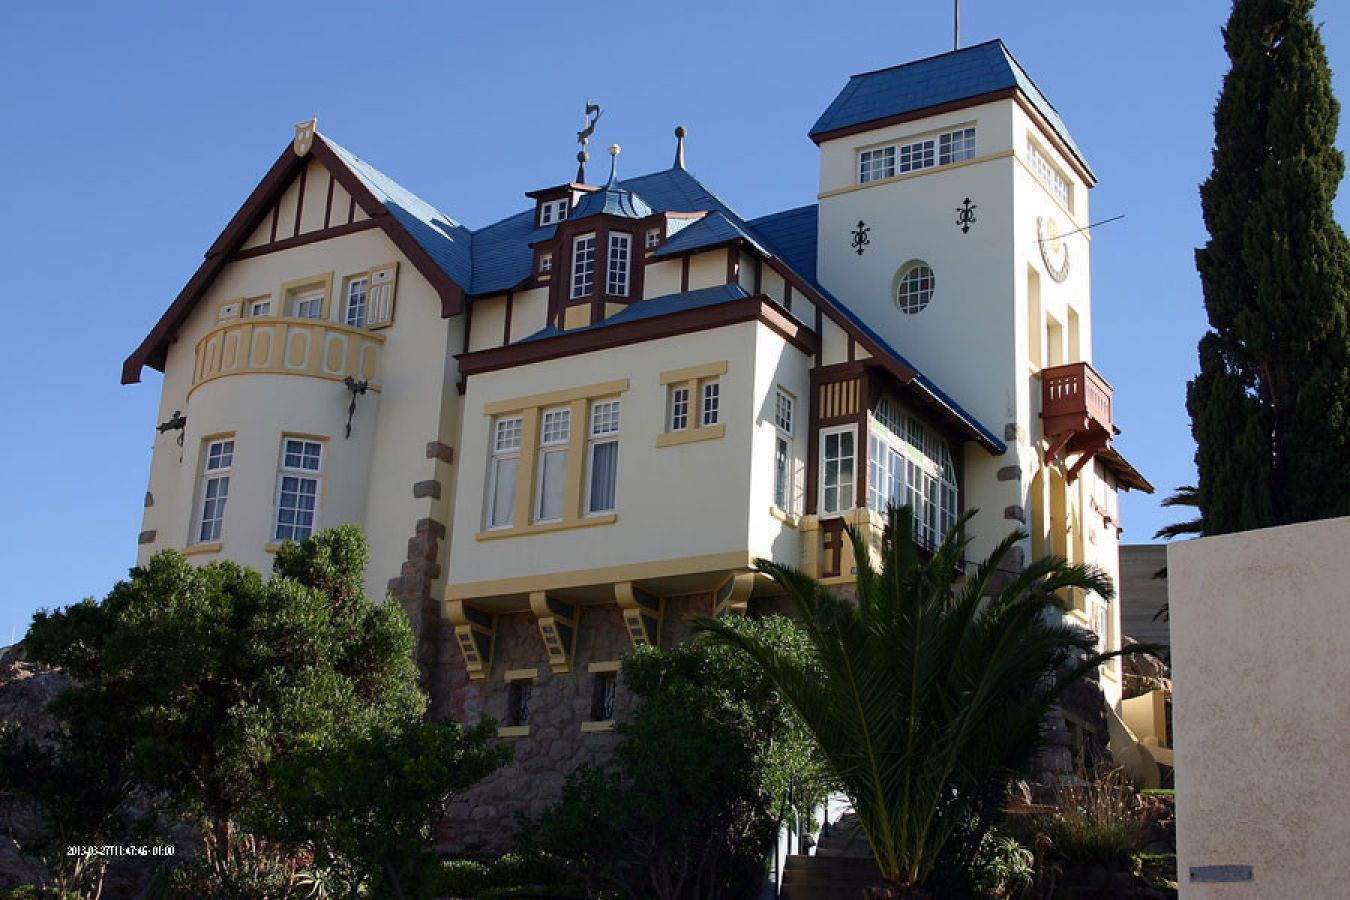 Goerke Haus Lüderitz